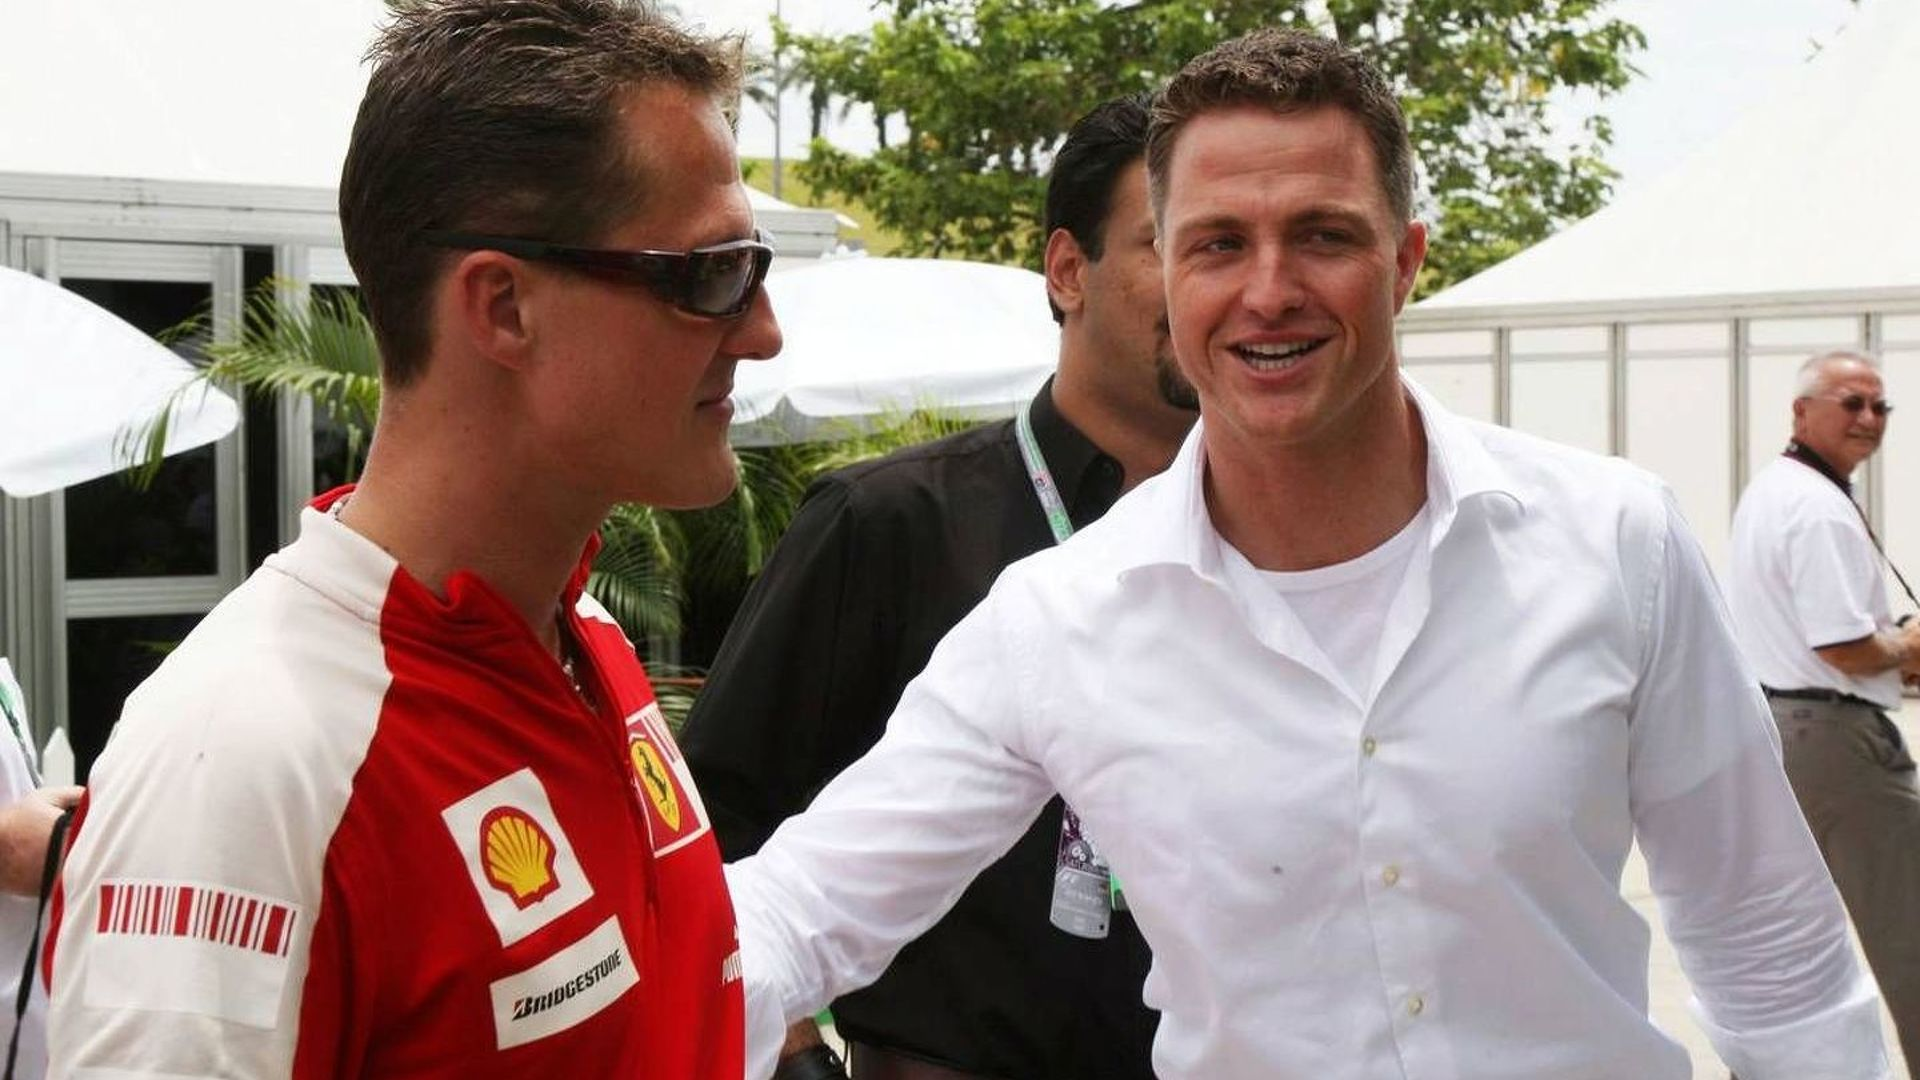 Schumacher sells kart track to brother Ralf